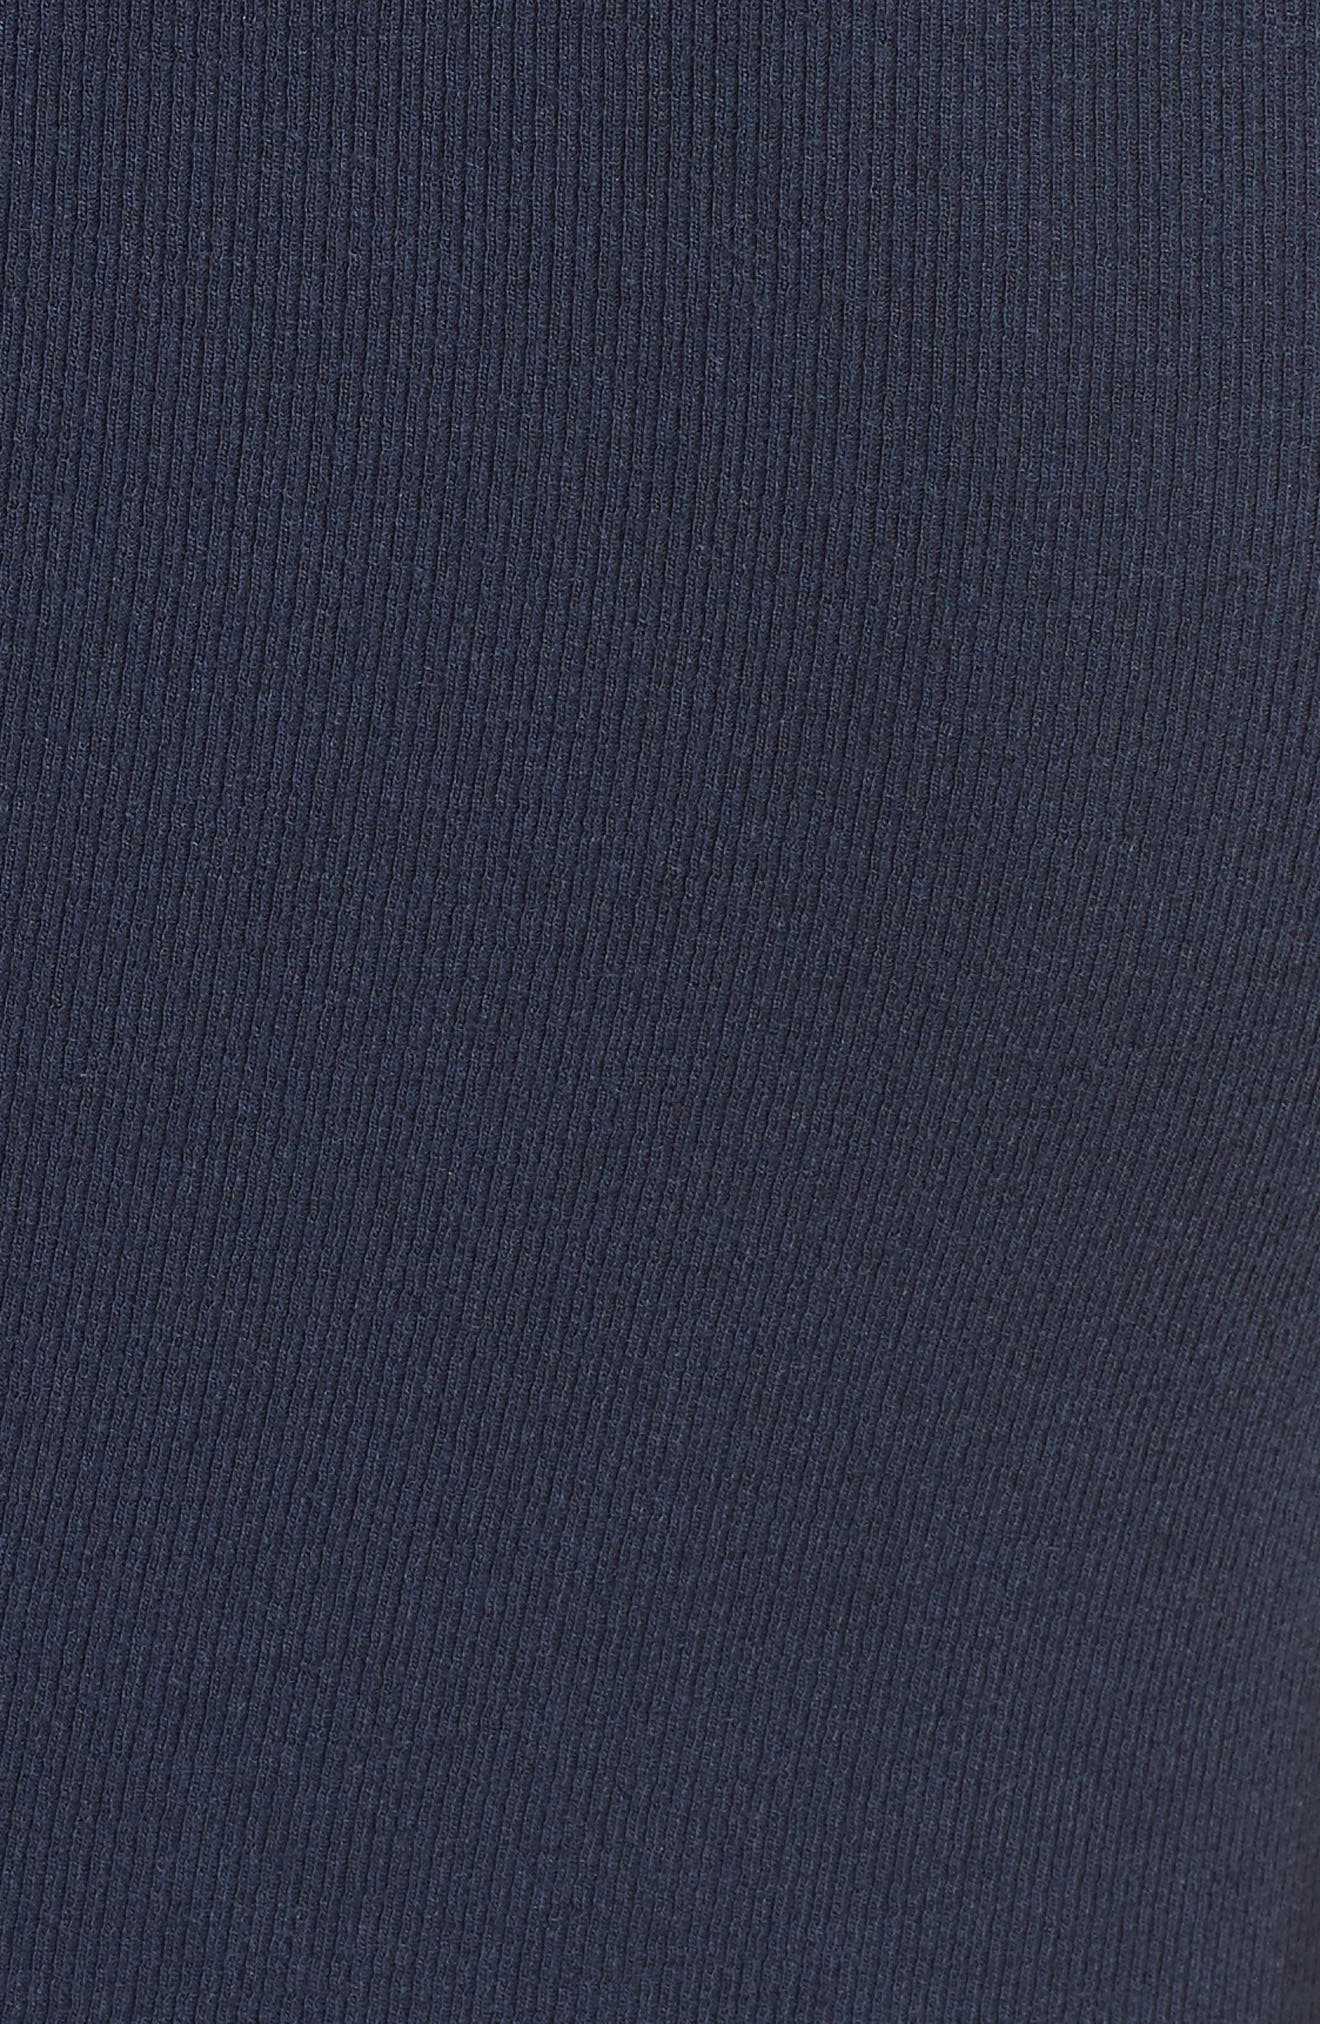 Knit Stretch Modal Dress,                             Alternate thumbnail 5, color,